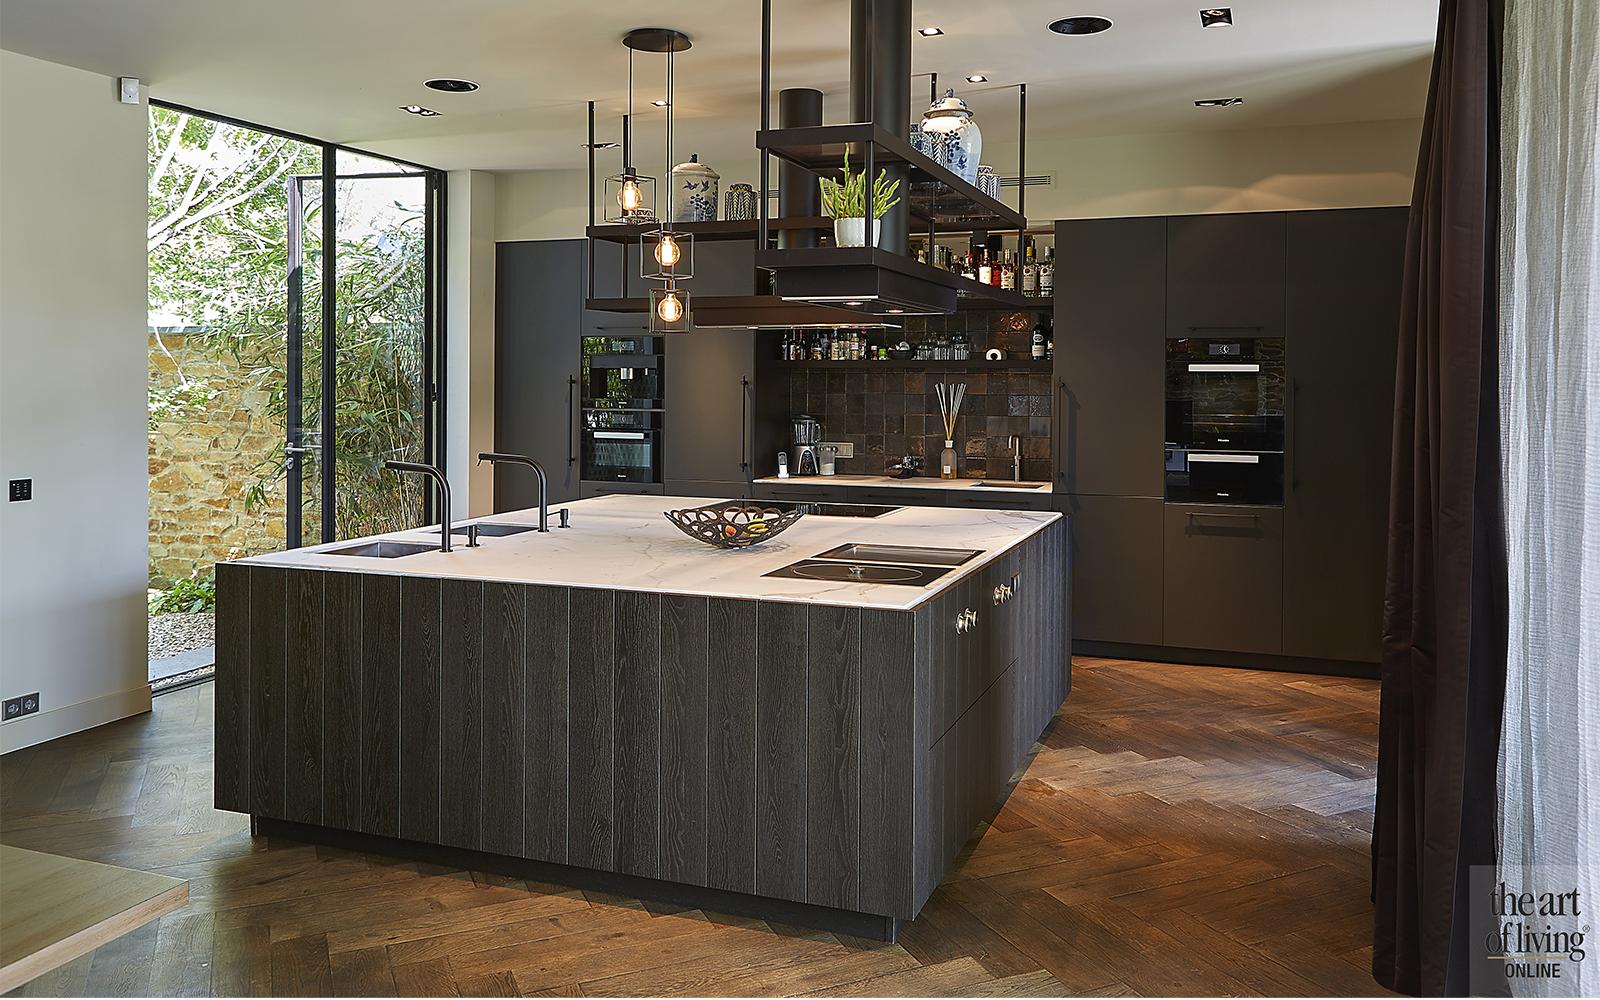 Moderne architectuur, Architectenbureau Kabaz, Luxe inrichting, Luxe interieur, Modern interieur, Maatwerk interieur, Keuken, Moderne keuken, Strak interieur, Donkere keuken